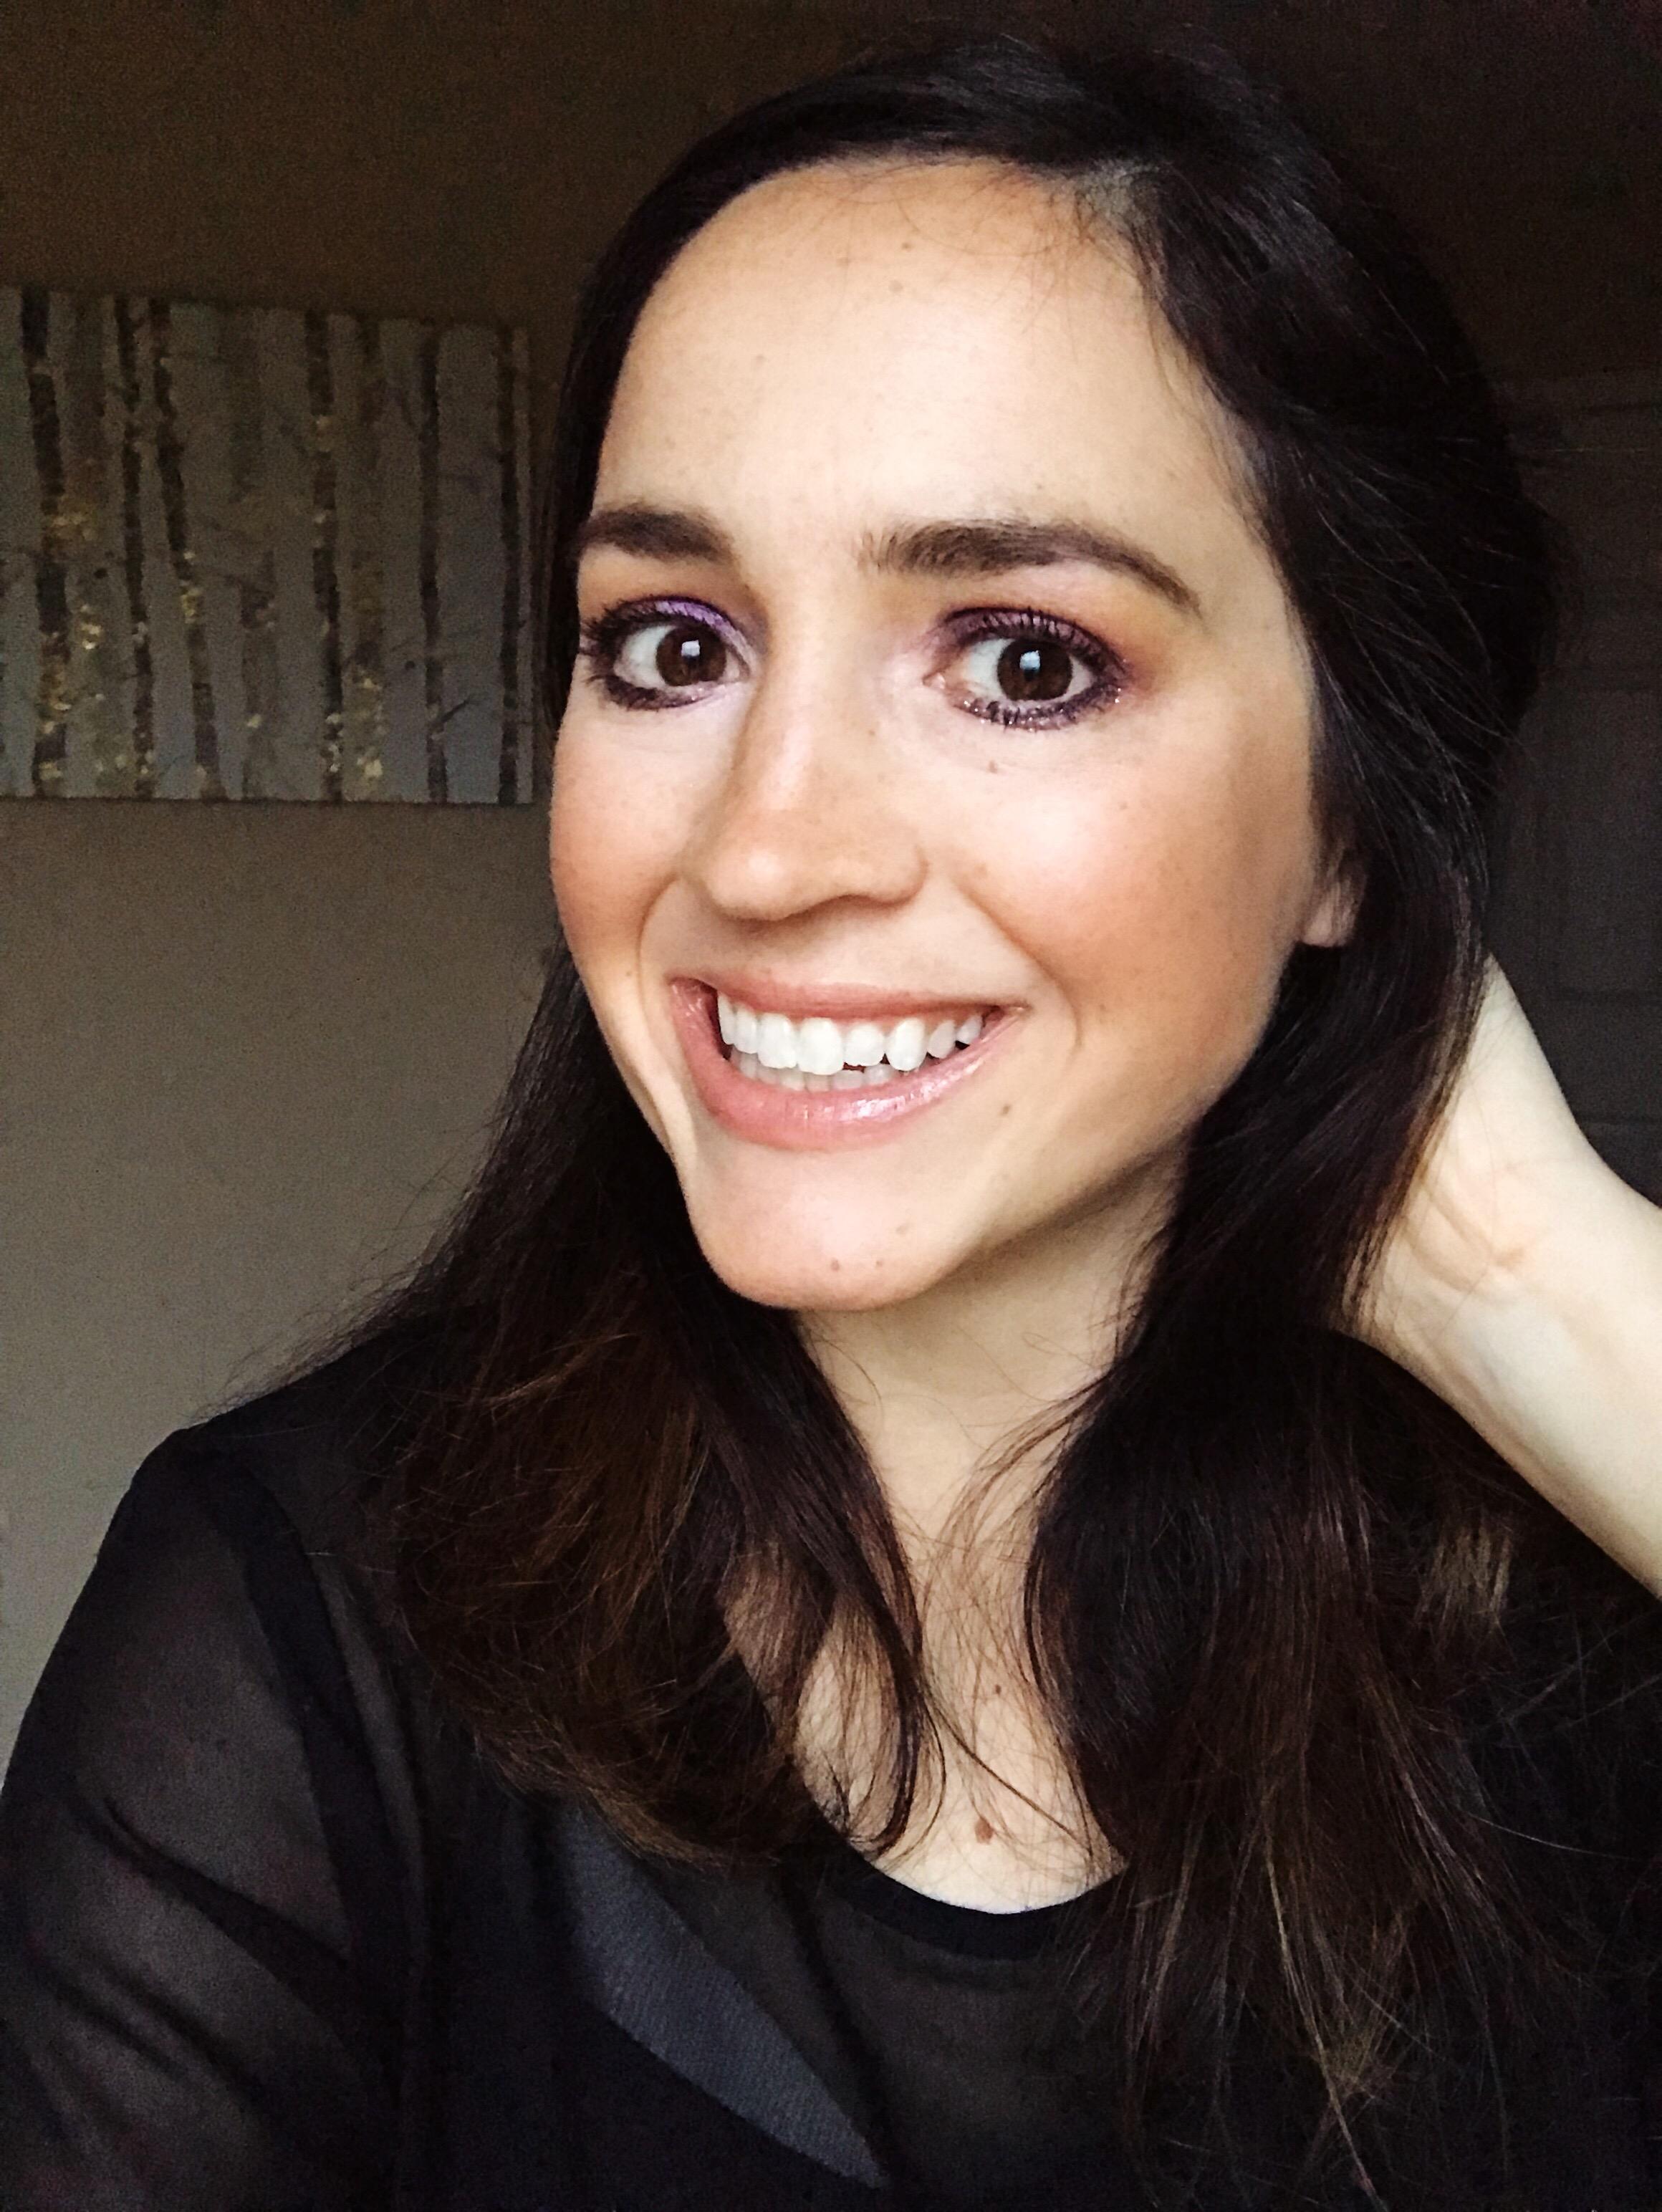 Easy Festive Eye Makeup Look | Mallorie Owens